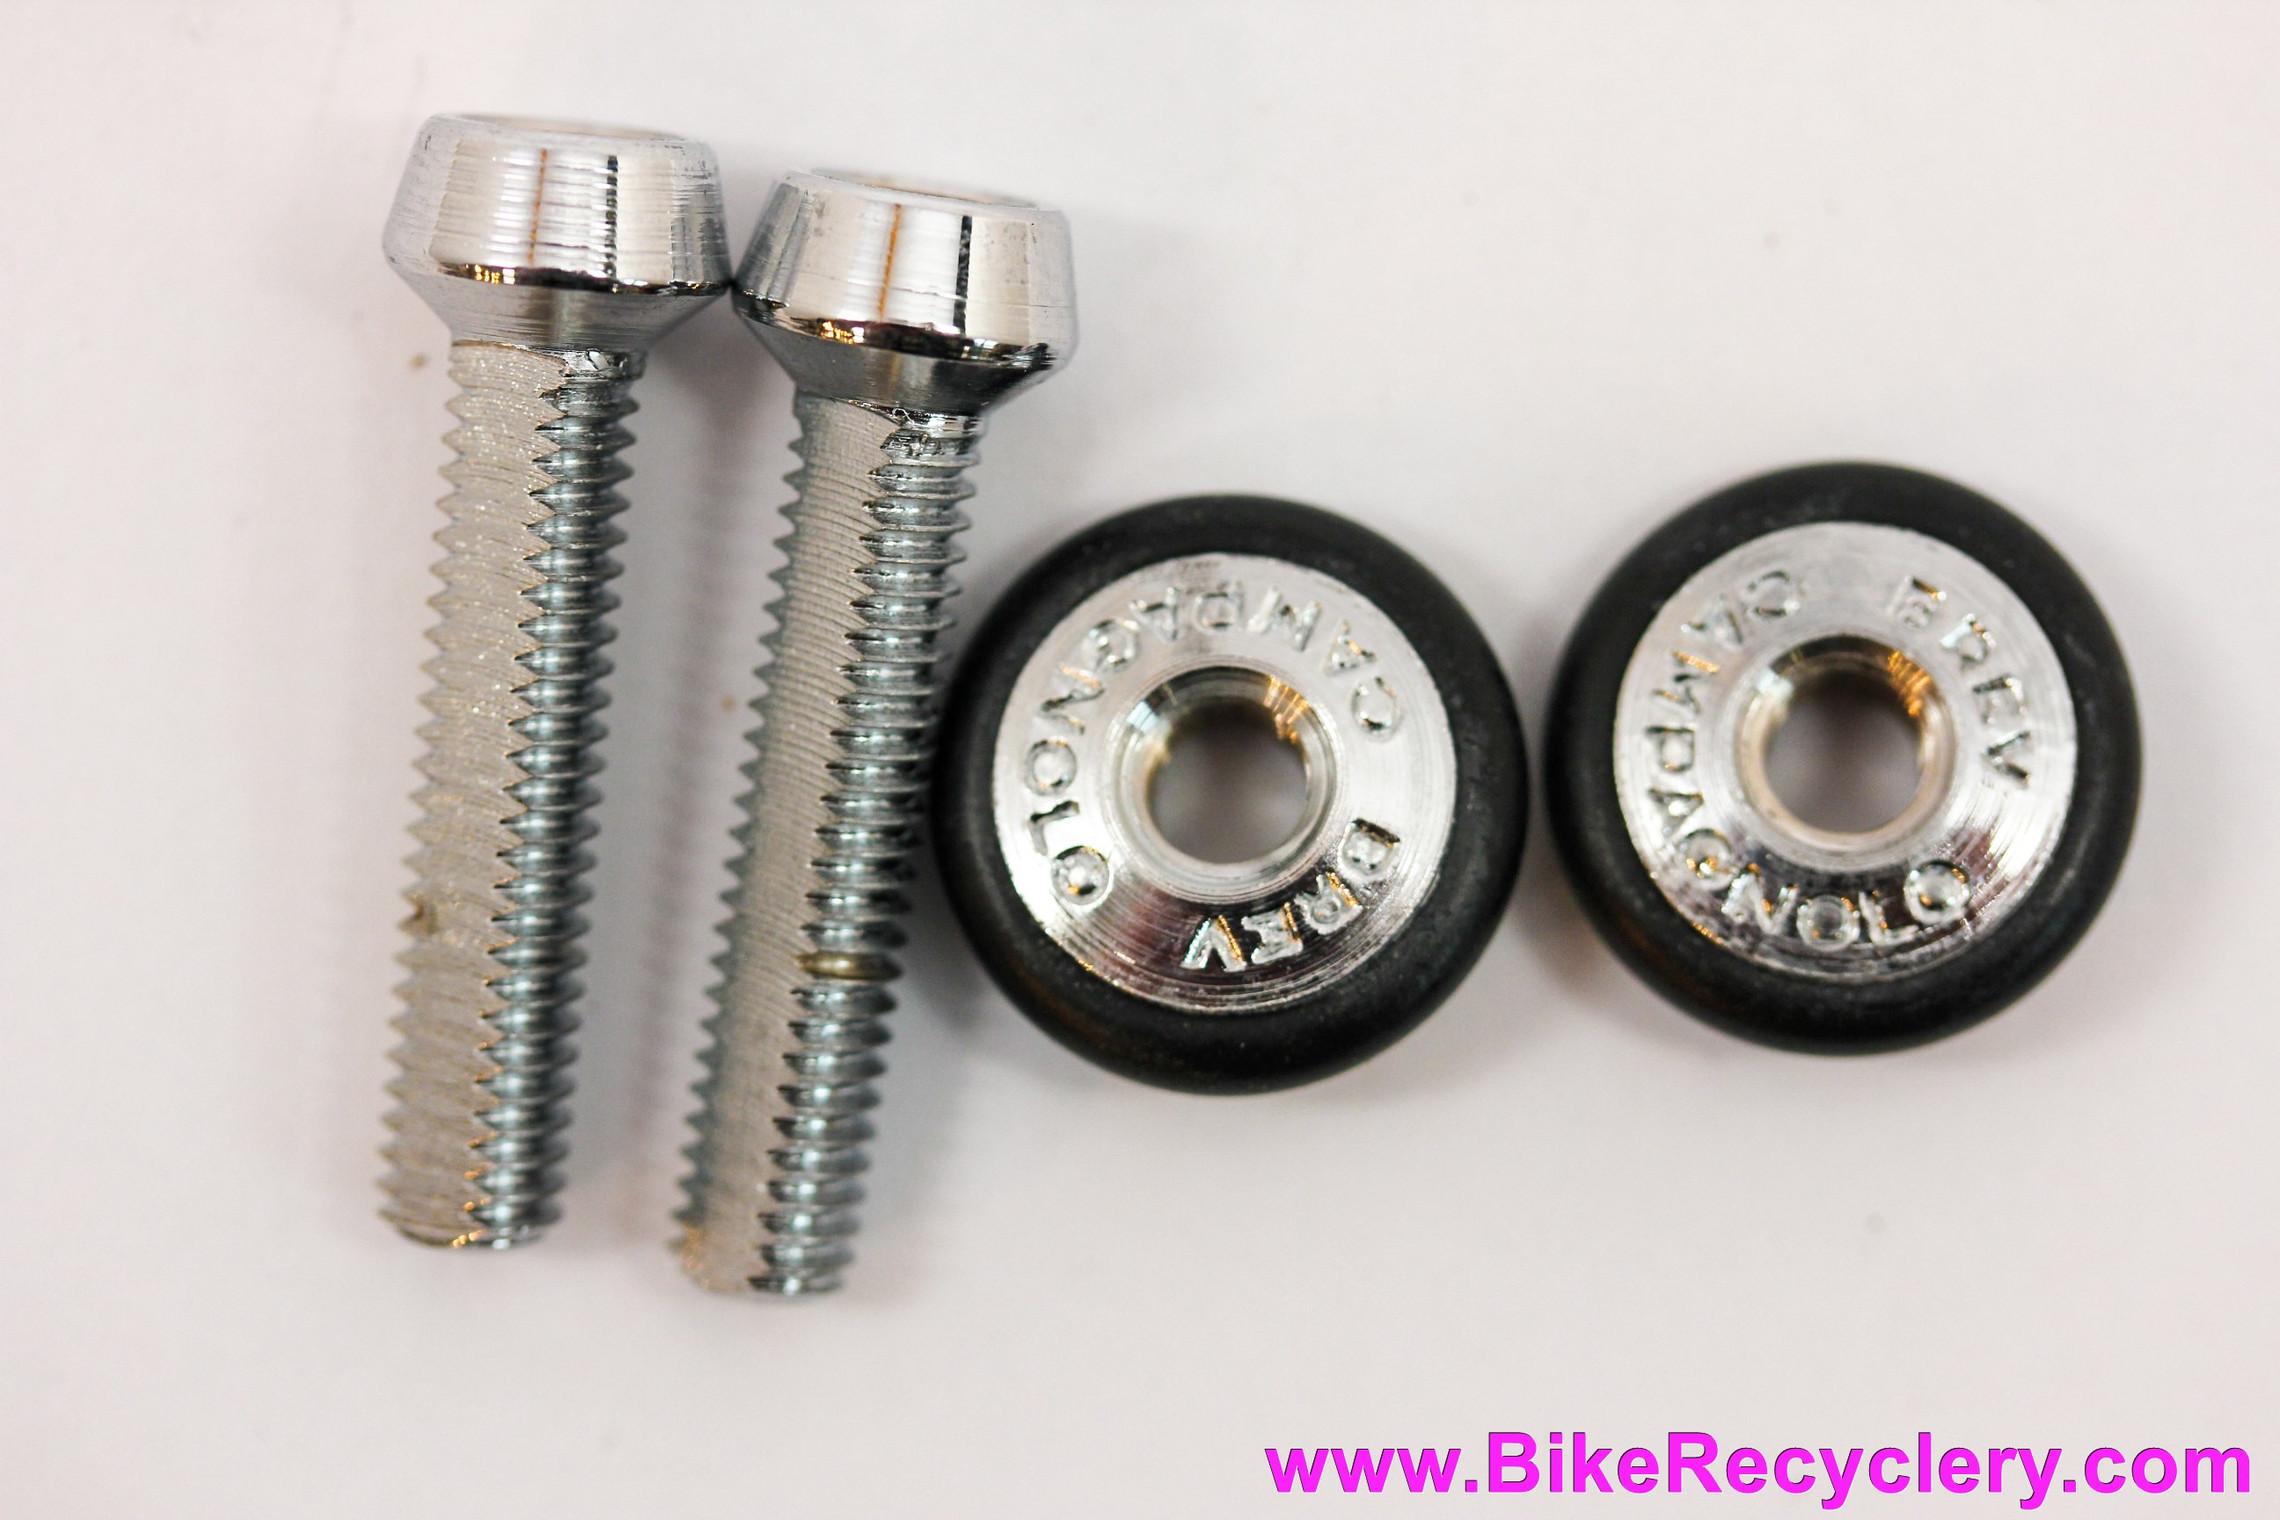 NOS Campagnolo Nuovo/Super Record Barrel Adjusters: PAIR - Black O-Rings - Fits Gran Sport / Triomphe / Victory / Monoplanar...